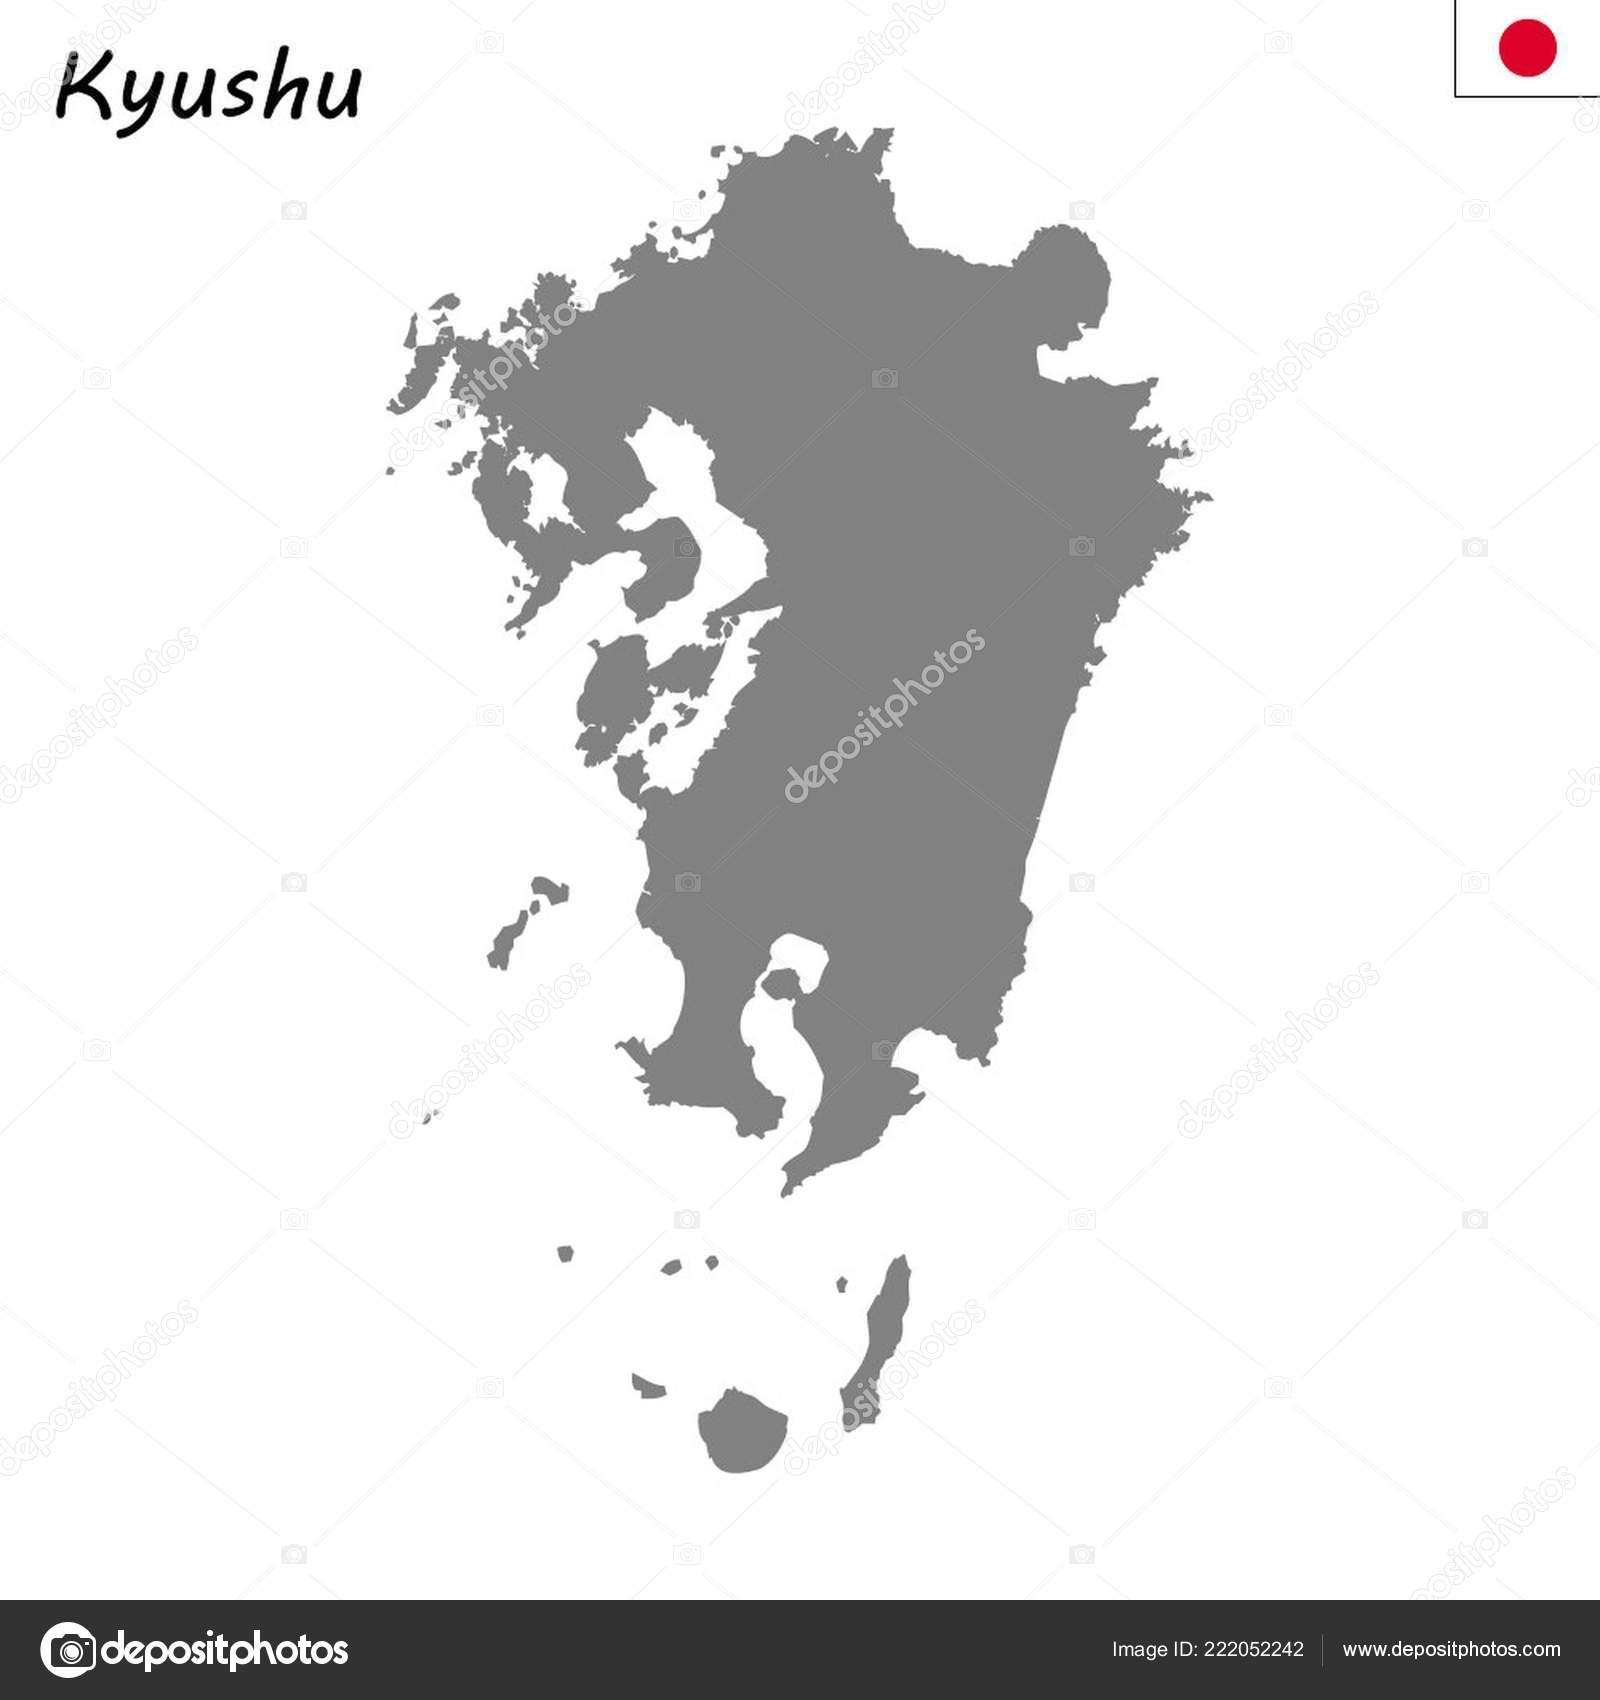 High Quality Map Kyushu Region Japan — Stock Vector ... on aomori prefecture japan map, edo japan map, thailand japan map, fukuoka japan map, kanagawa prefecture japan map, iwakuni japan map, nagano prefecture japan map, uruma japan map, minamata japan map, kuji japan map, mount koya japan map, dejima japan map, tokyo japan map, honshu japan map, gifu prefecture japan map, mt. fuji japan map, hokkaido japan map, shikoku japan map, nara japan map, nagasaki japan map,